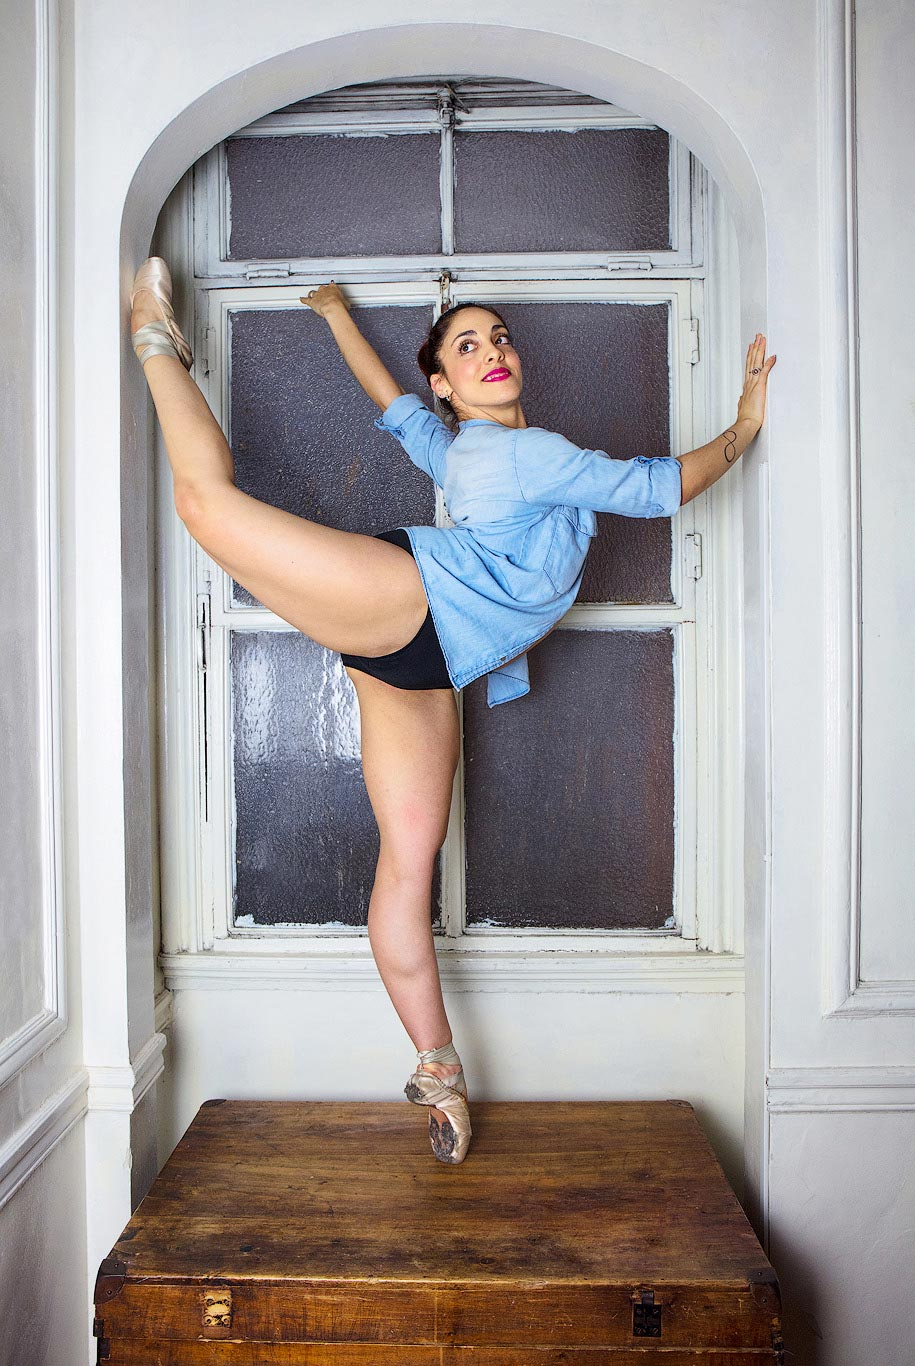 Victoria dancer photo shoot